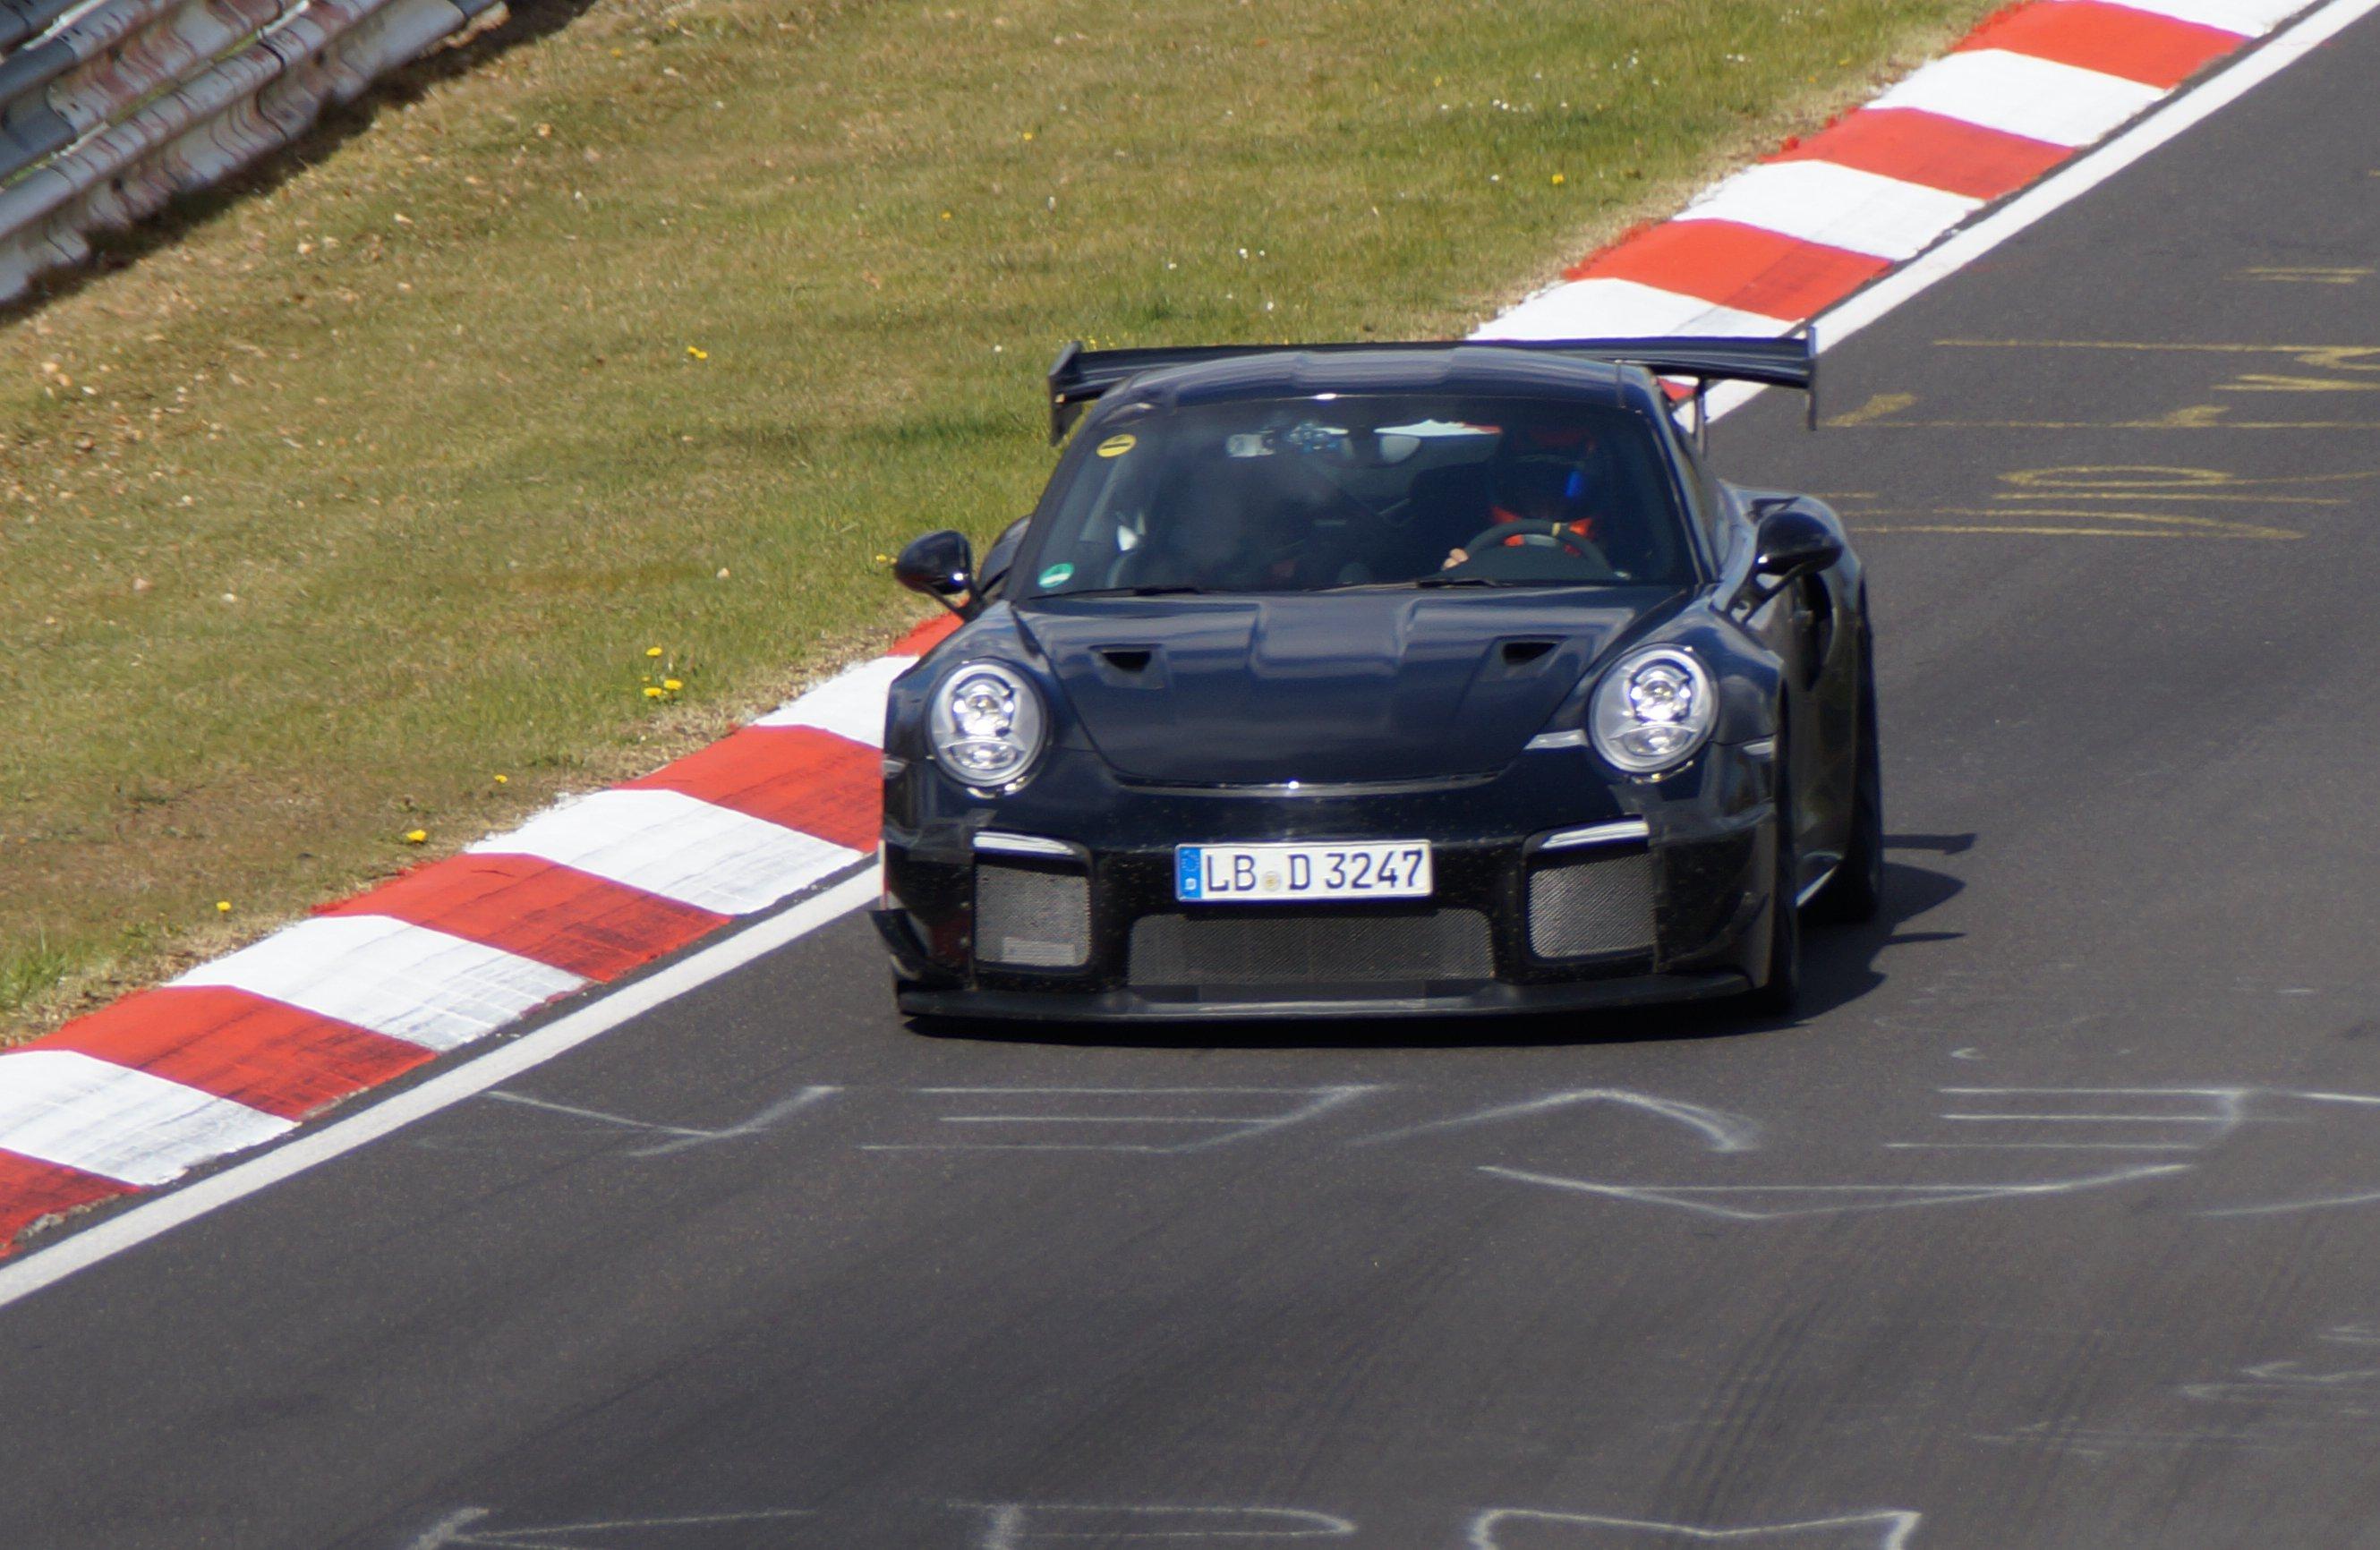 Porsche 911 GT2 RS, foto Wilco Blok